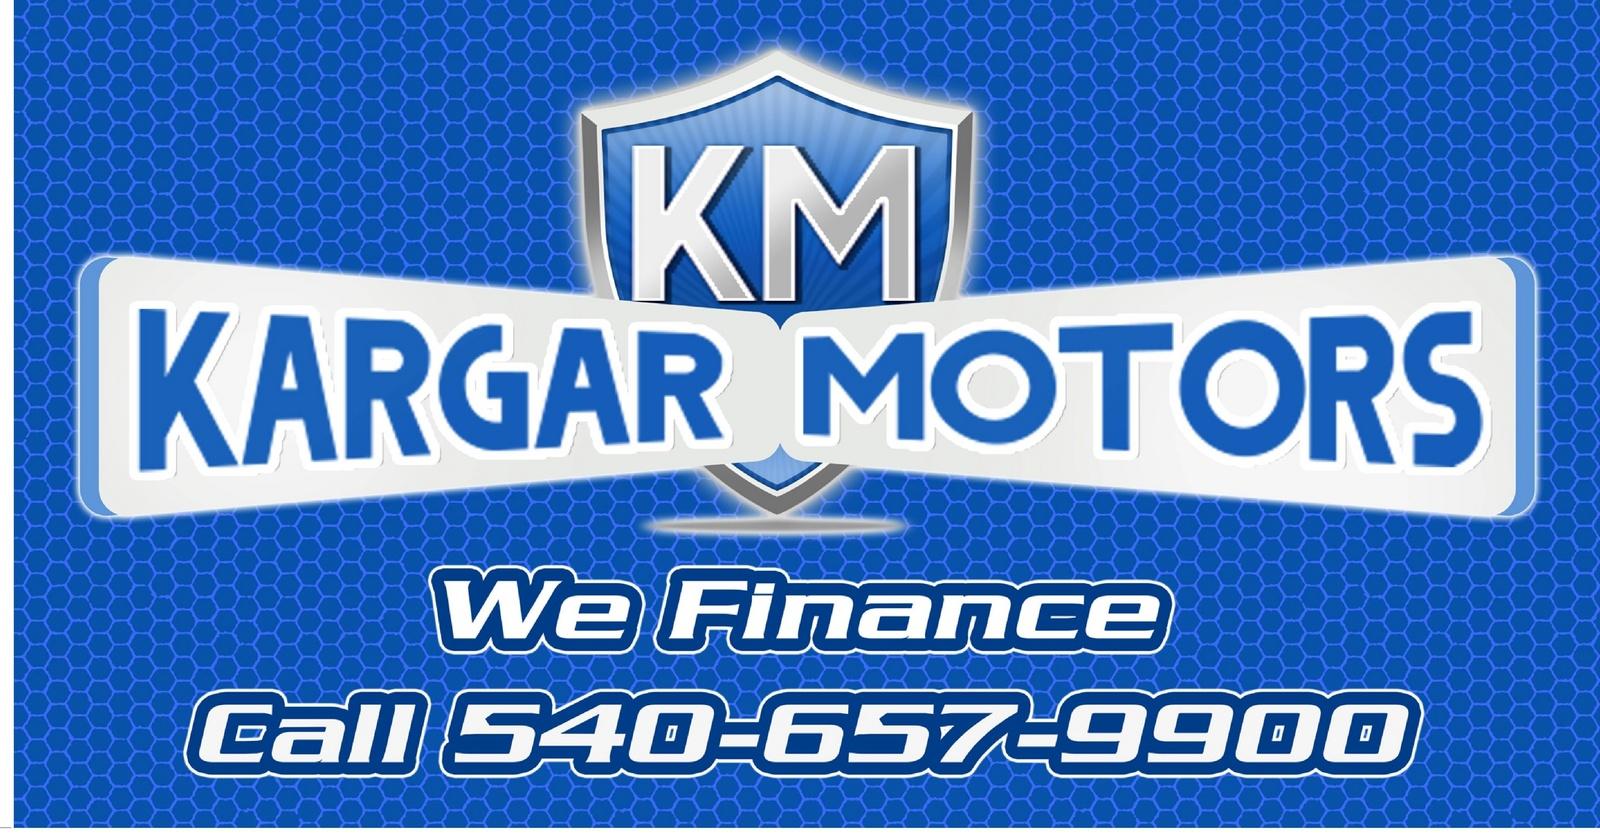 Kargar Motors Stafford Va Reviews Amp Deals Cargurus